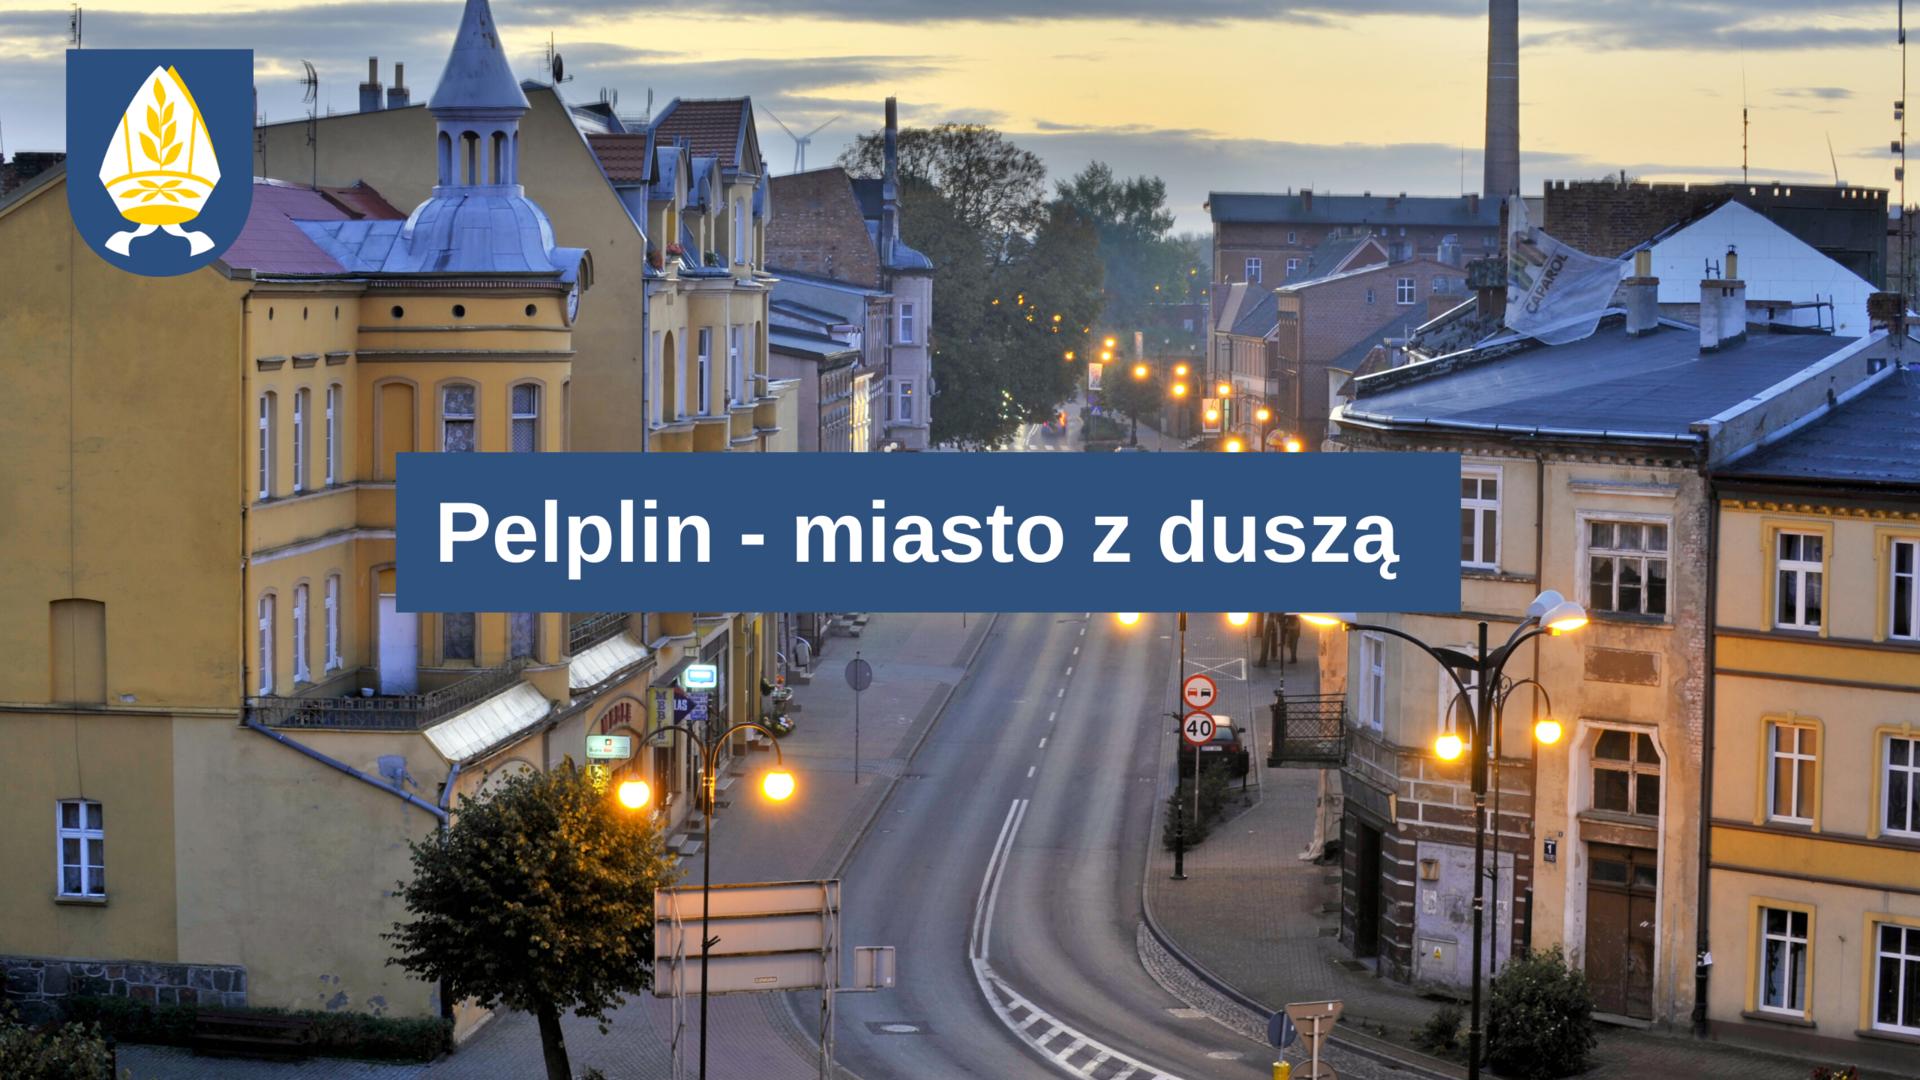 Pelplin miasto z duszą 2 [2560x1440]